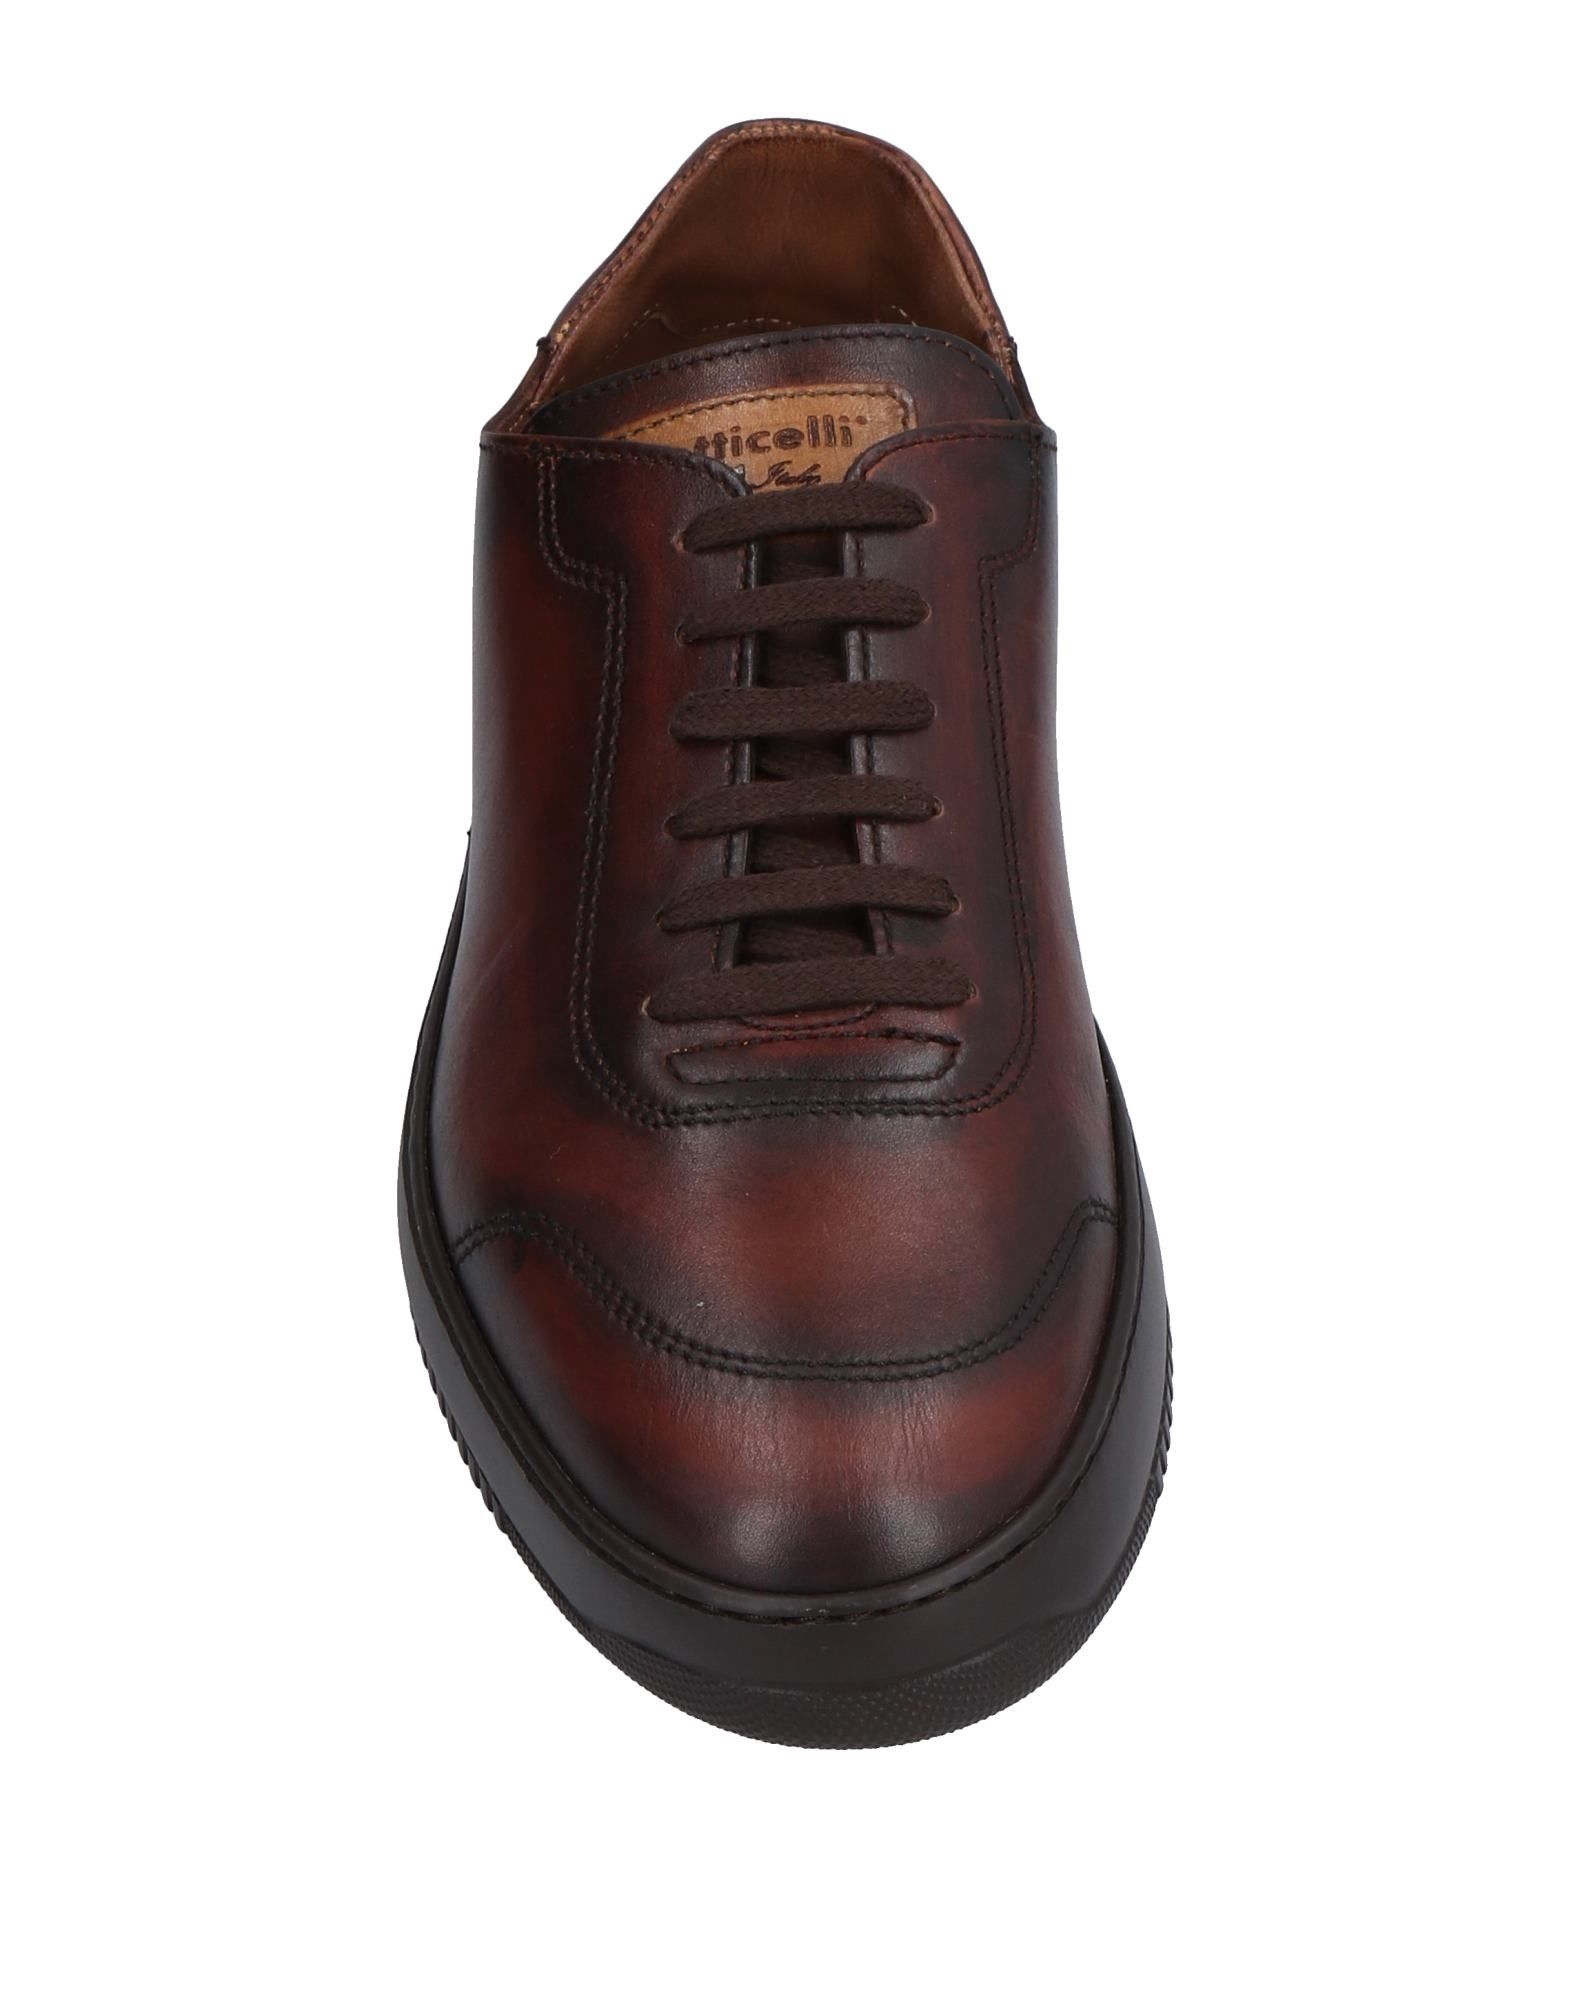 Roberto Botticelli Sneakers Herren  Schuhe 11515361KB Gute Qualität beliebte Schuhe  218b61